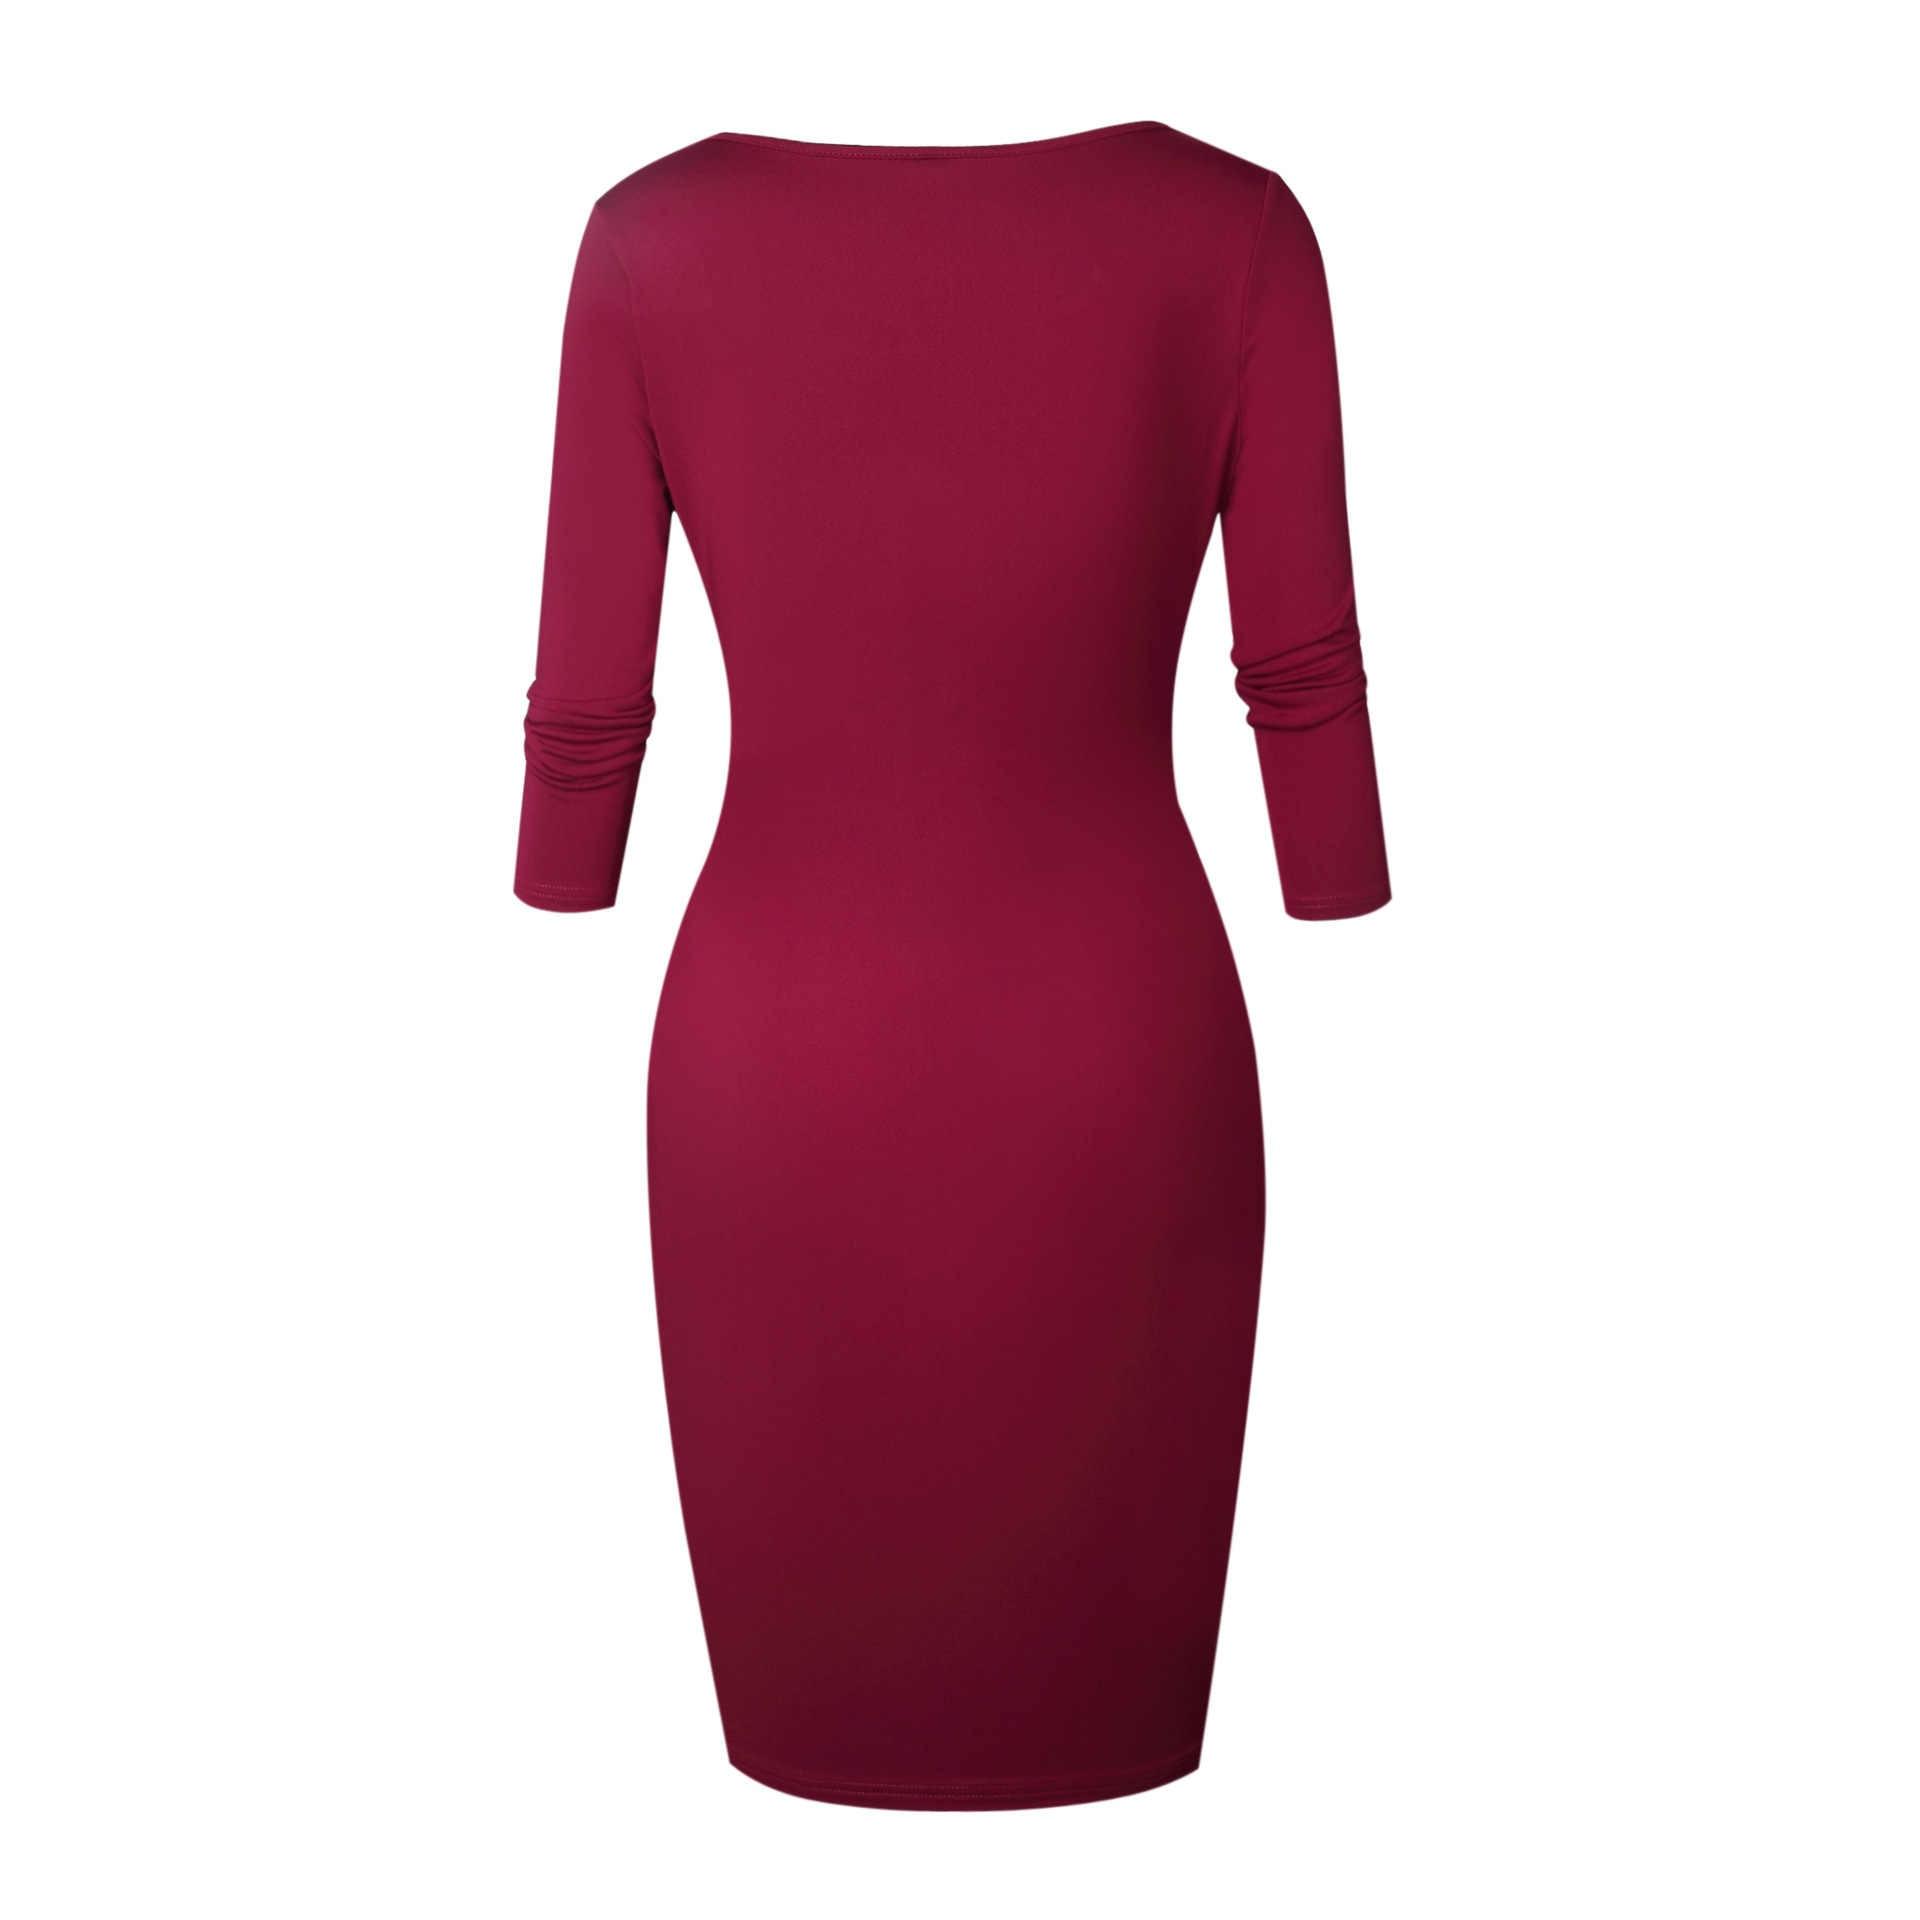 AVODOVAMA M Women Sexy Bodycon Dress New Fashion Low Cut Red Sheath Zipper Office Ladies Party Club Dresses 2019 Spring Summer